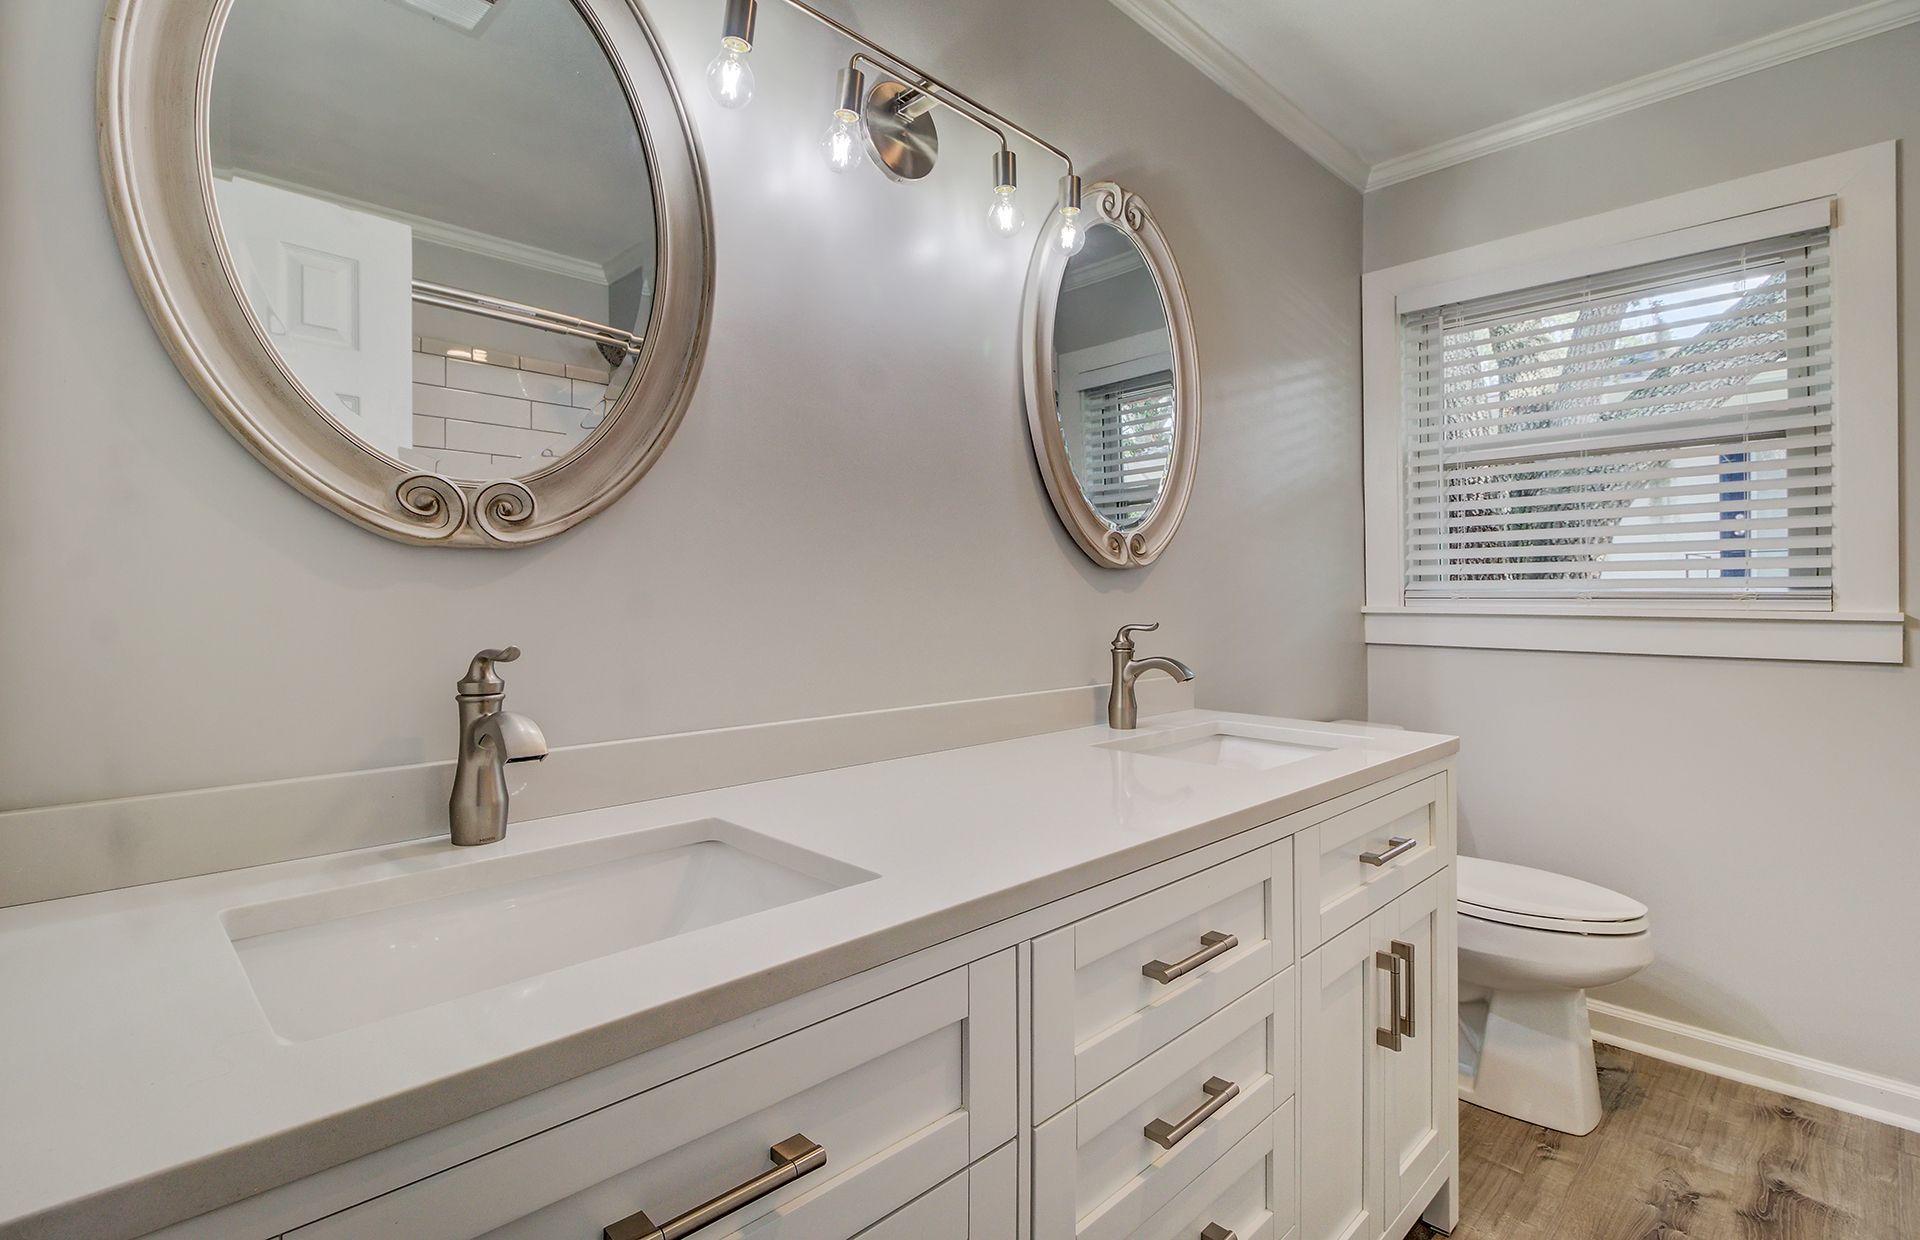 Belvedere Estates Homes For Sale - 6010 Ridgecrest, Hanahan, SC - 18